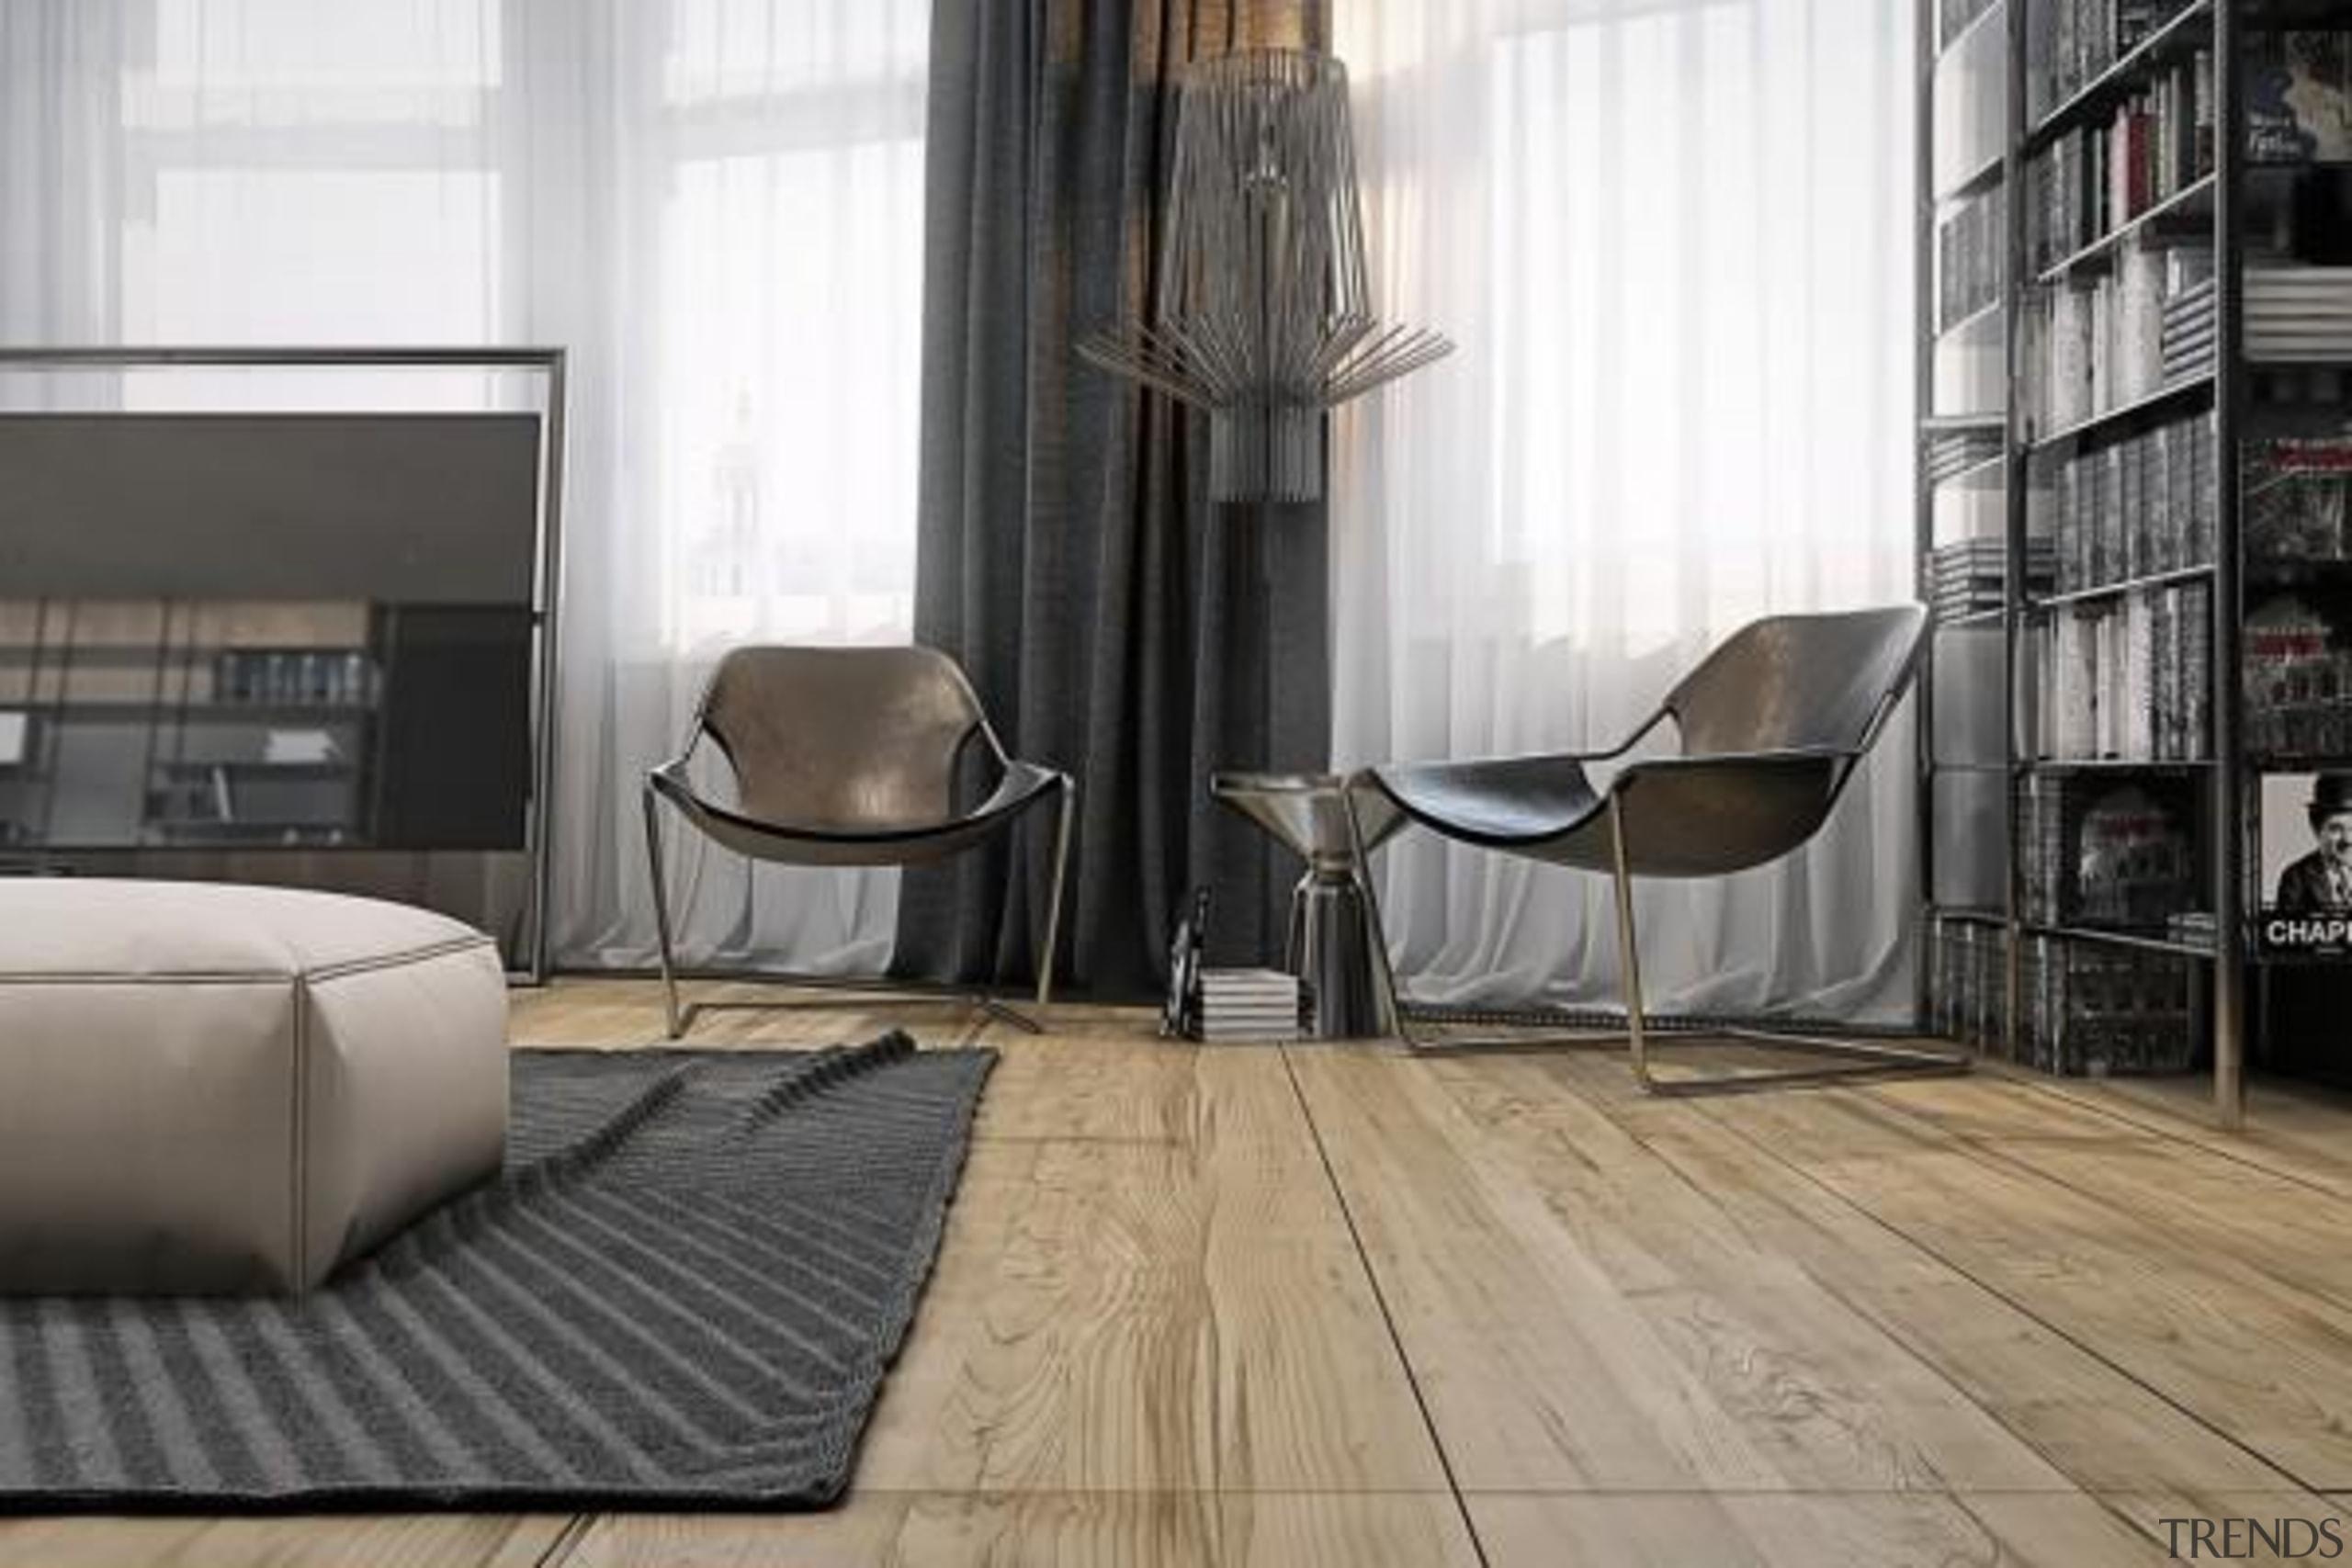 leather sling chairs - Masculine Apartments - architecture architecture, chair, floor, flooring, furniture, hardwood, interior design, laminate flooring, living room, table, tile, window, wood, wood flooring, white, black